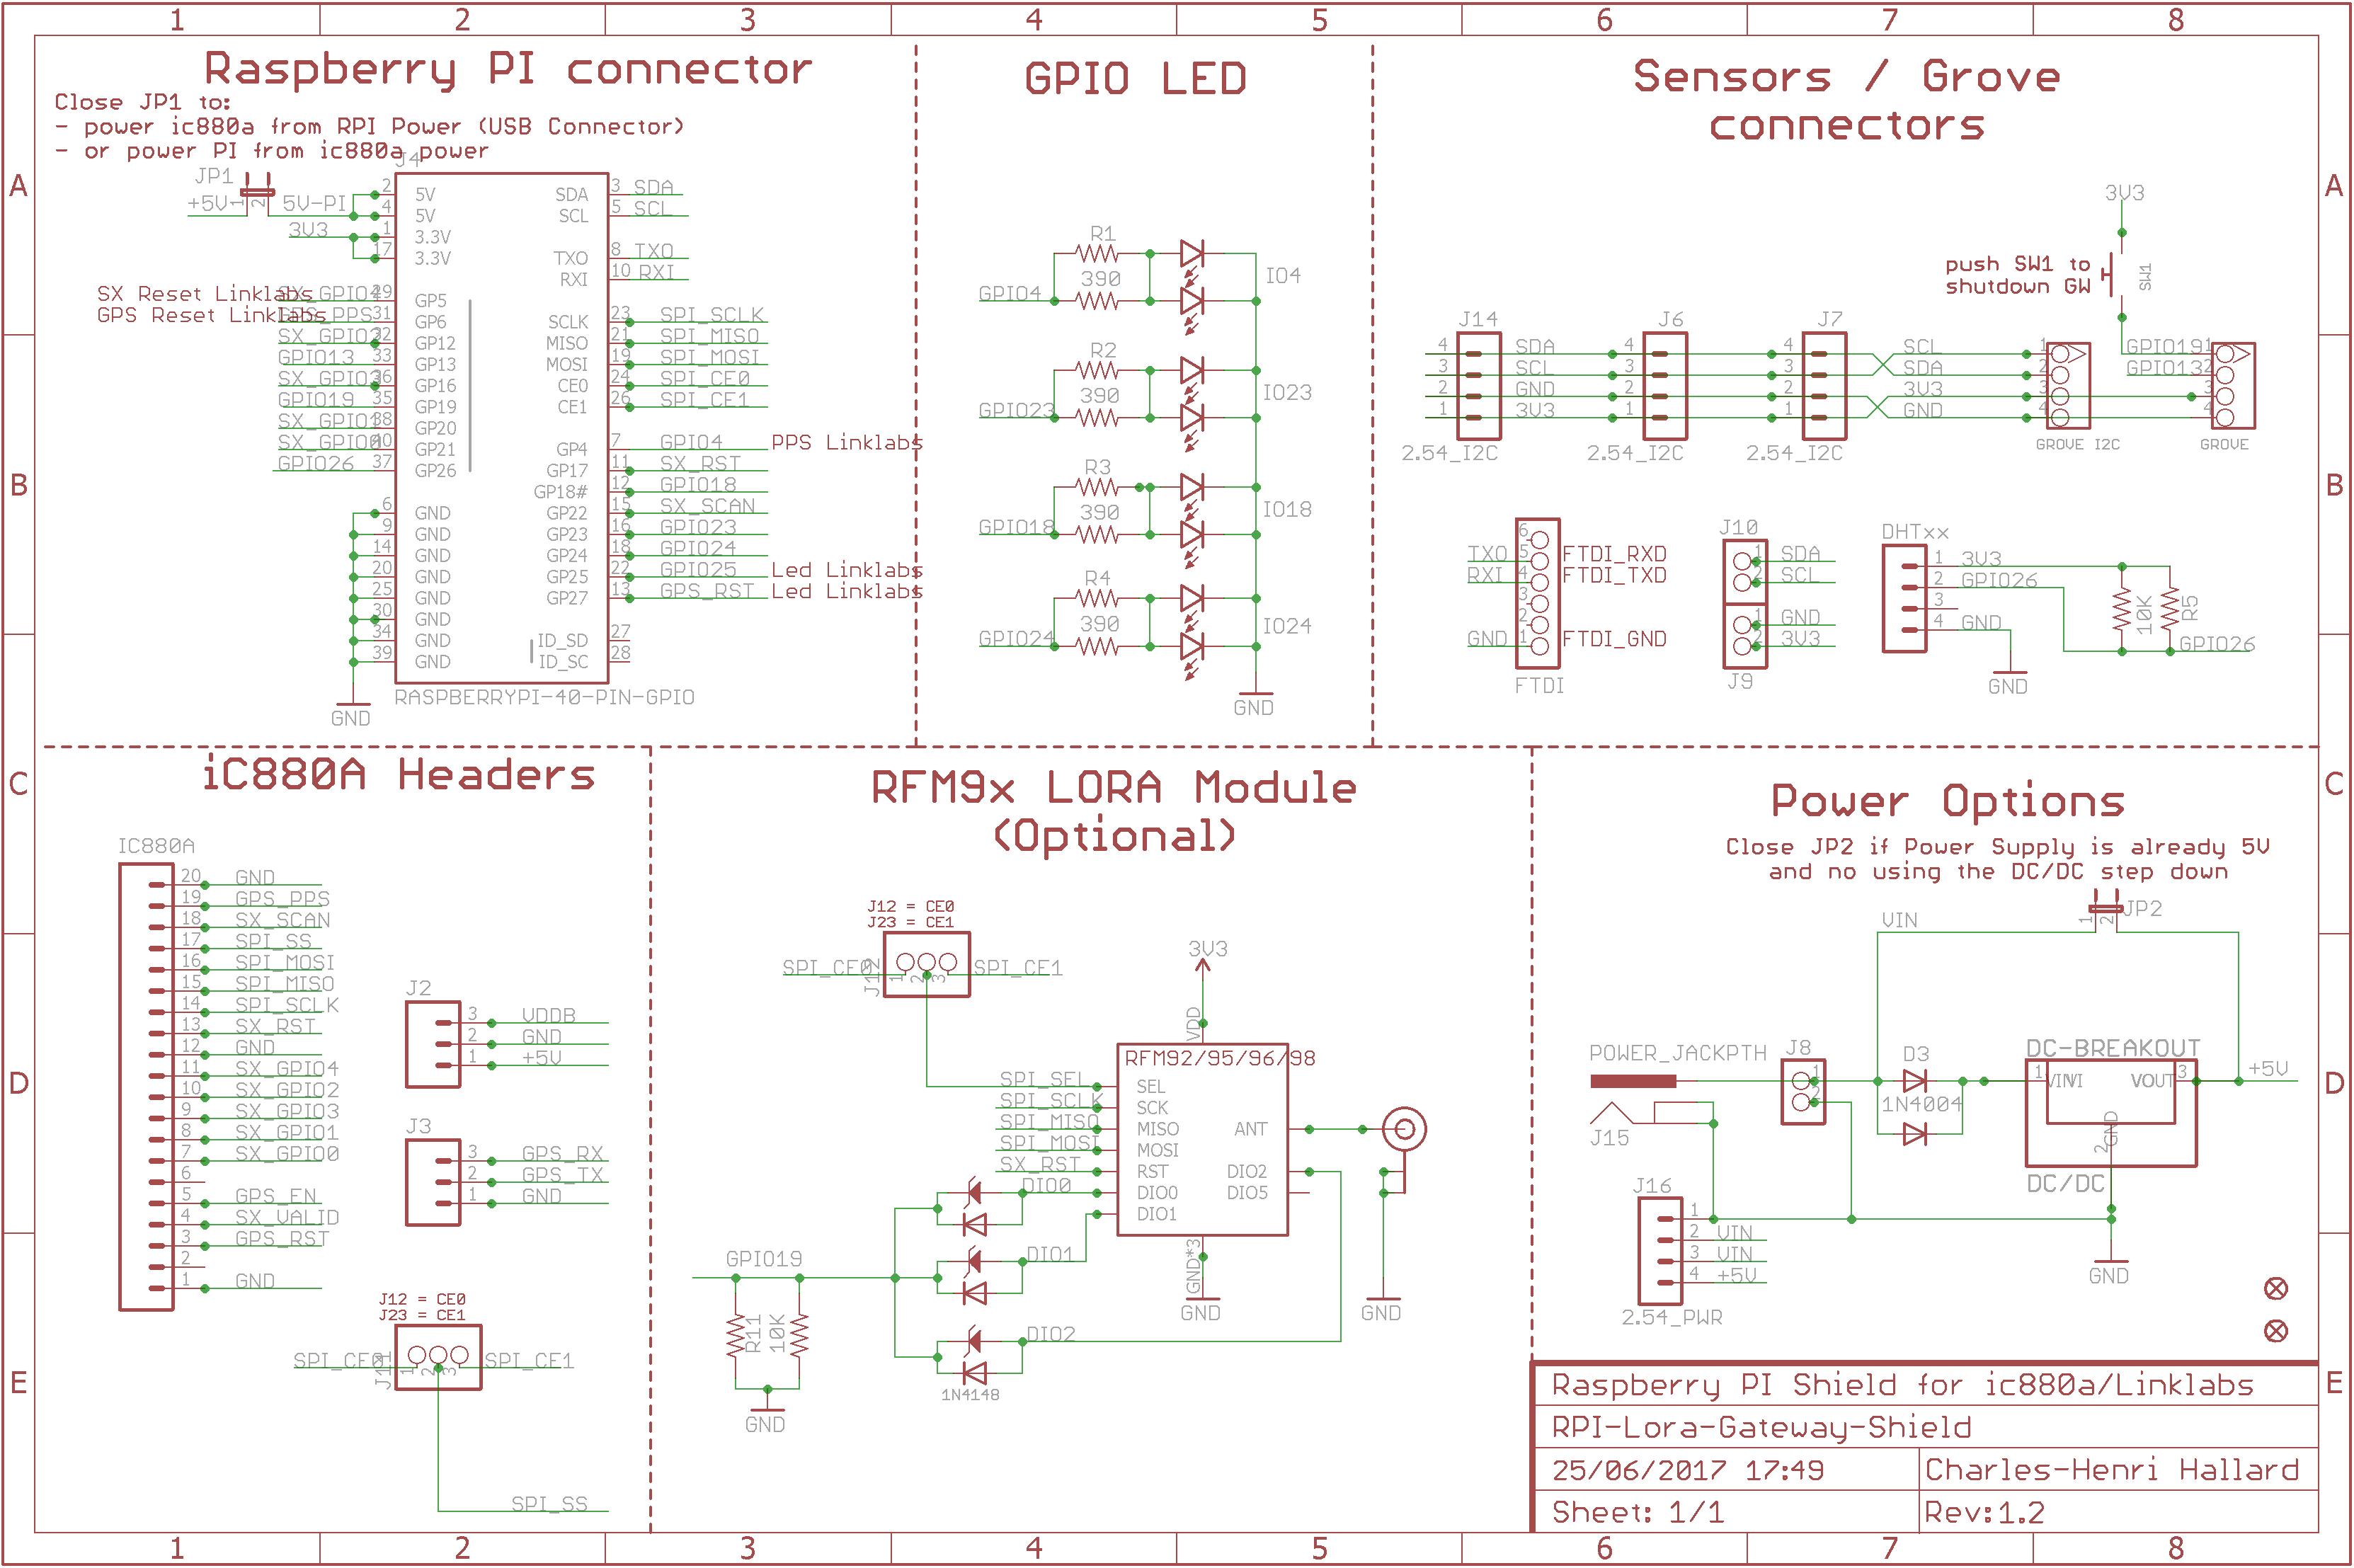 ch2i Raspberry PI iC880A and LinkLab Lora Gateway Shield on